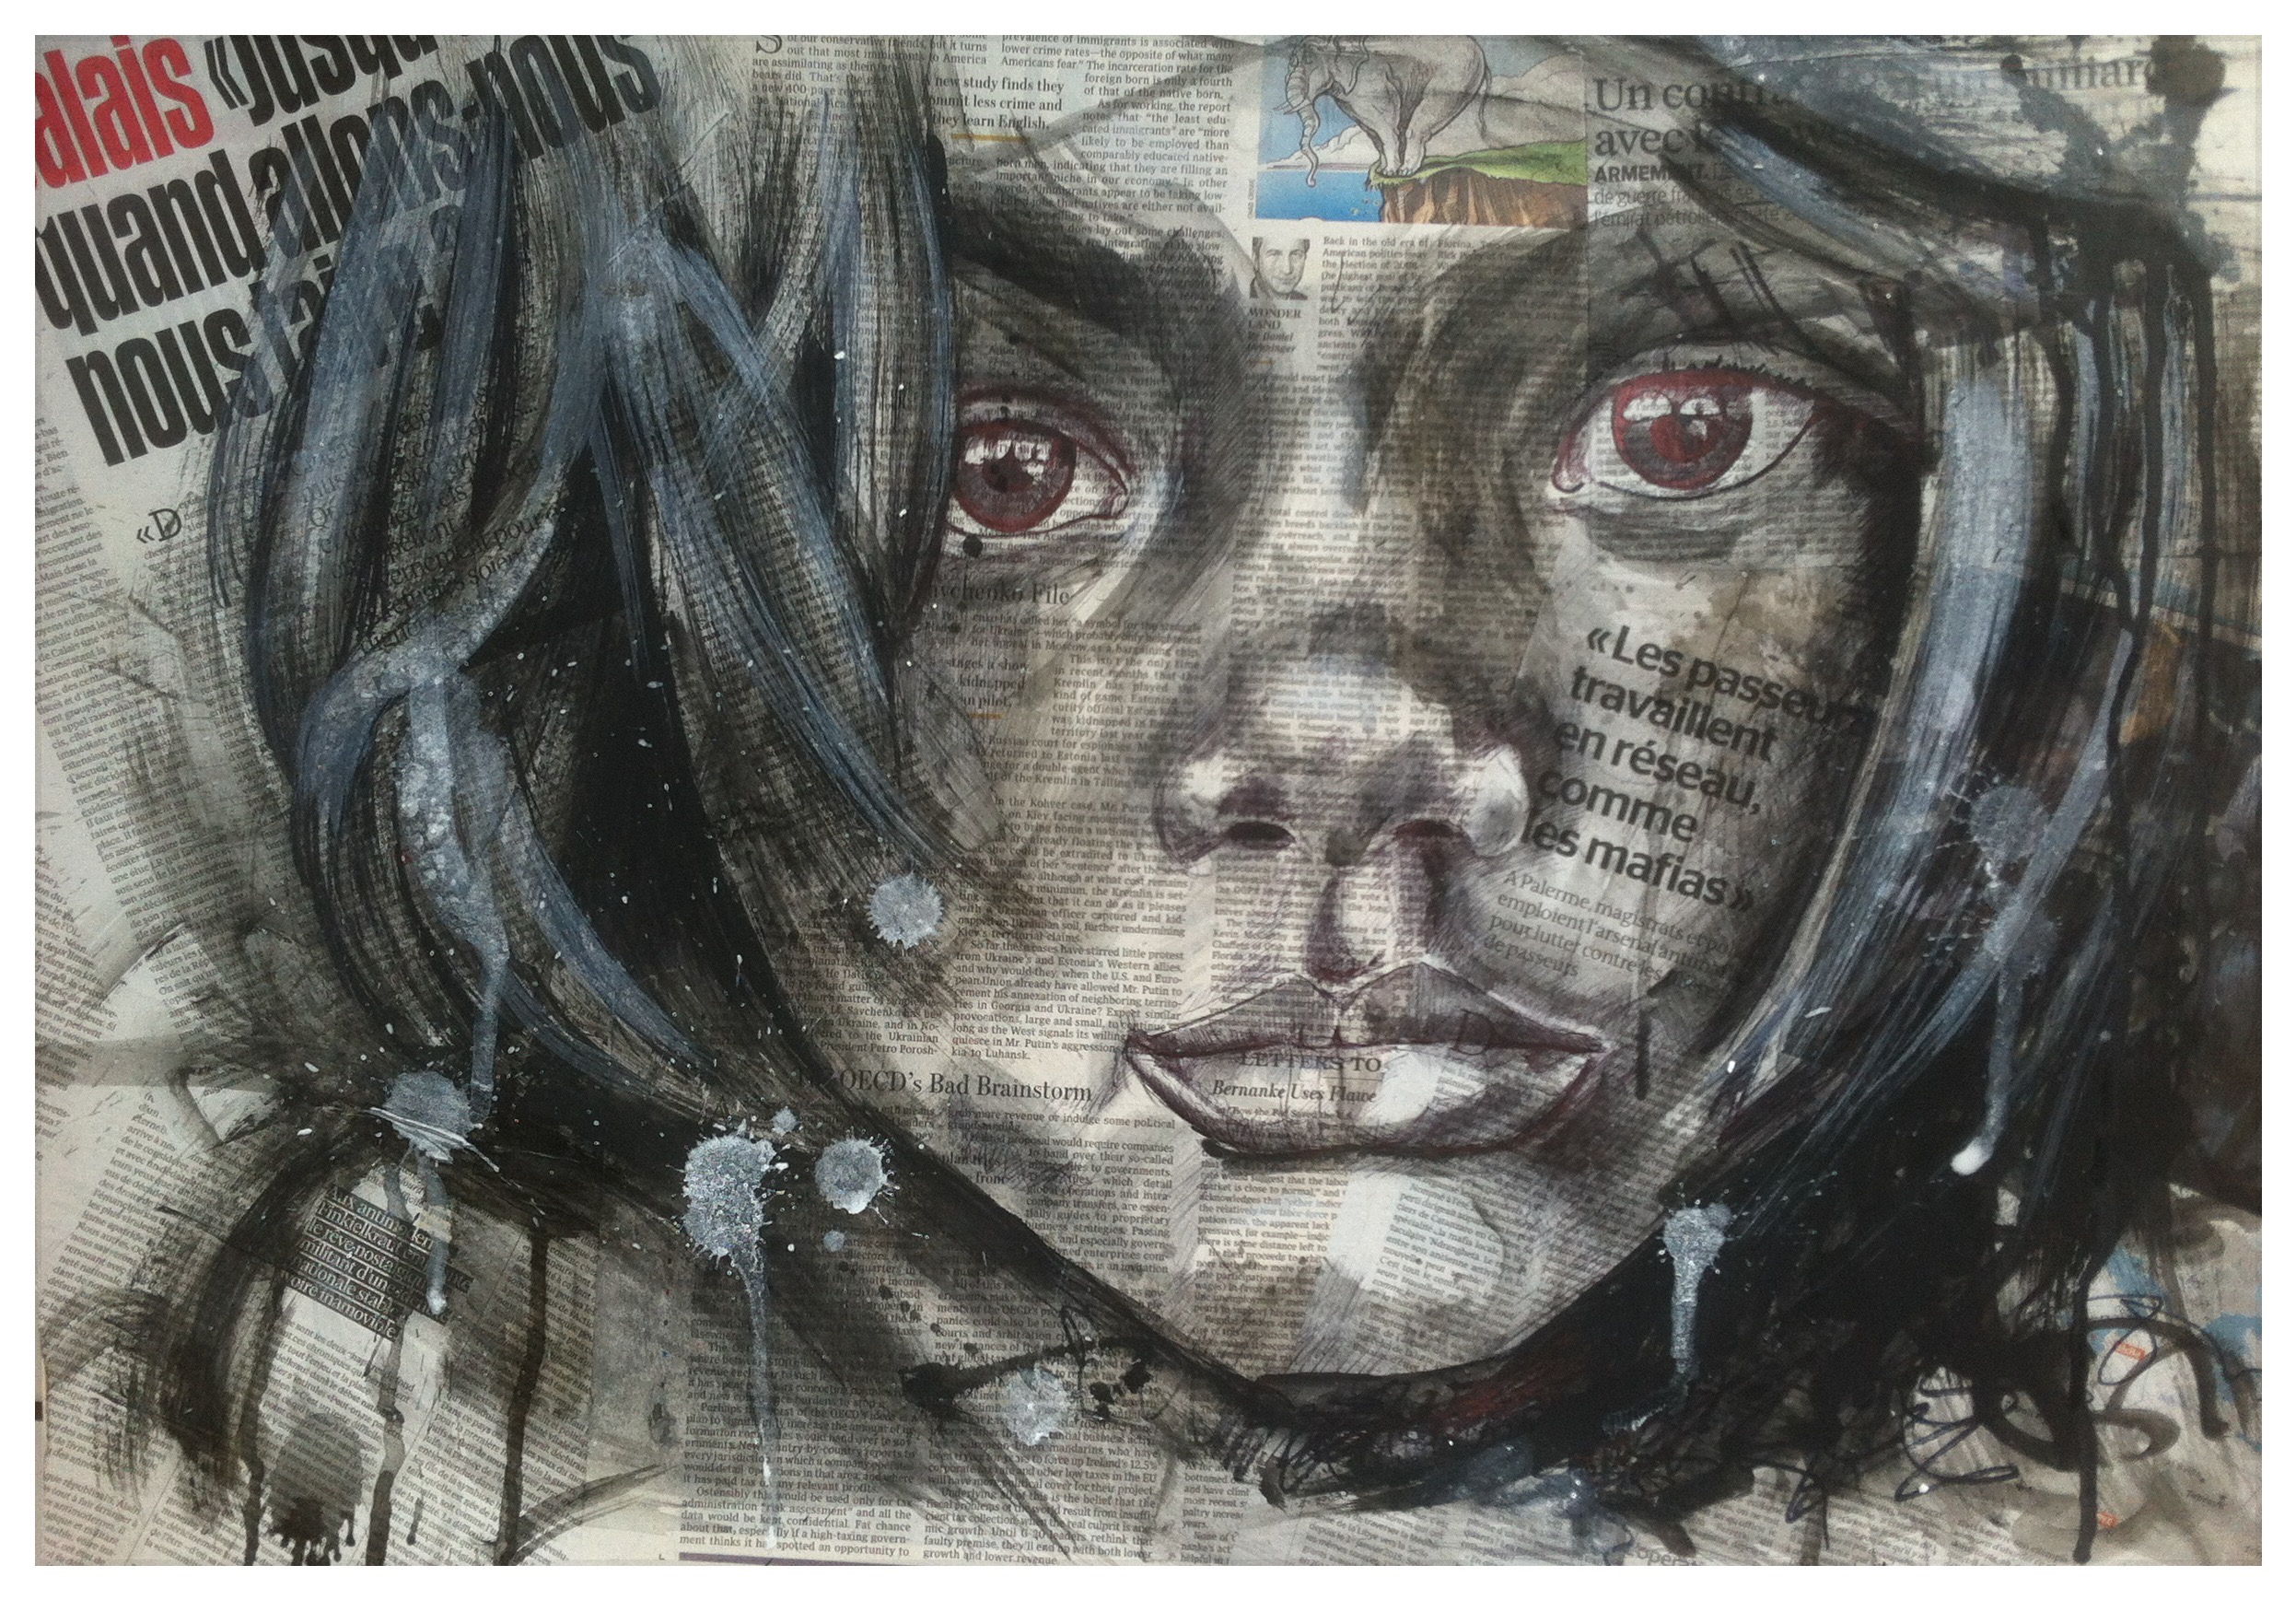 Réfugié (50x70) vendu